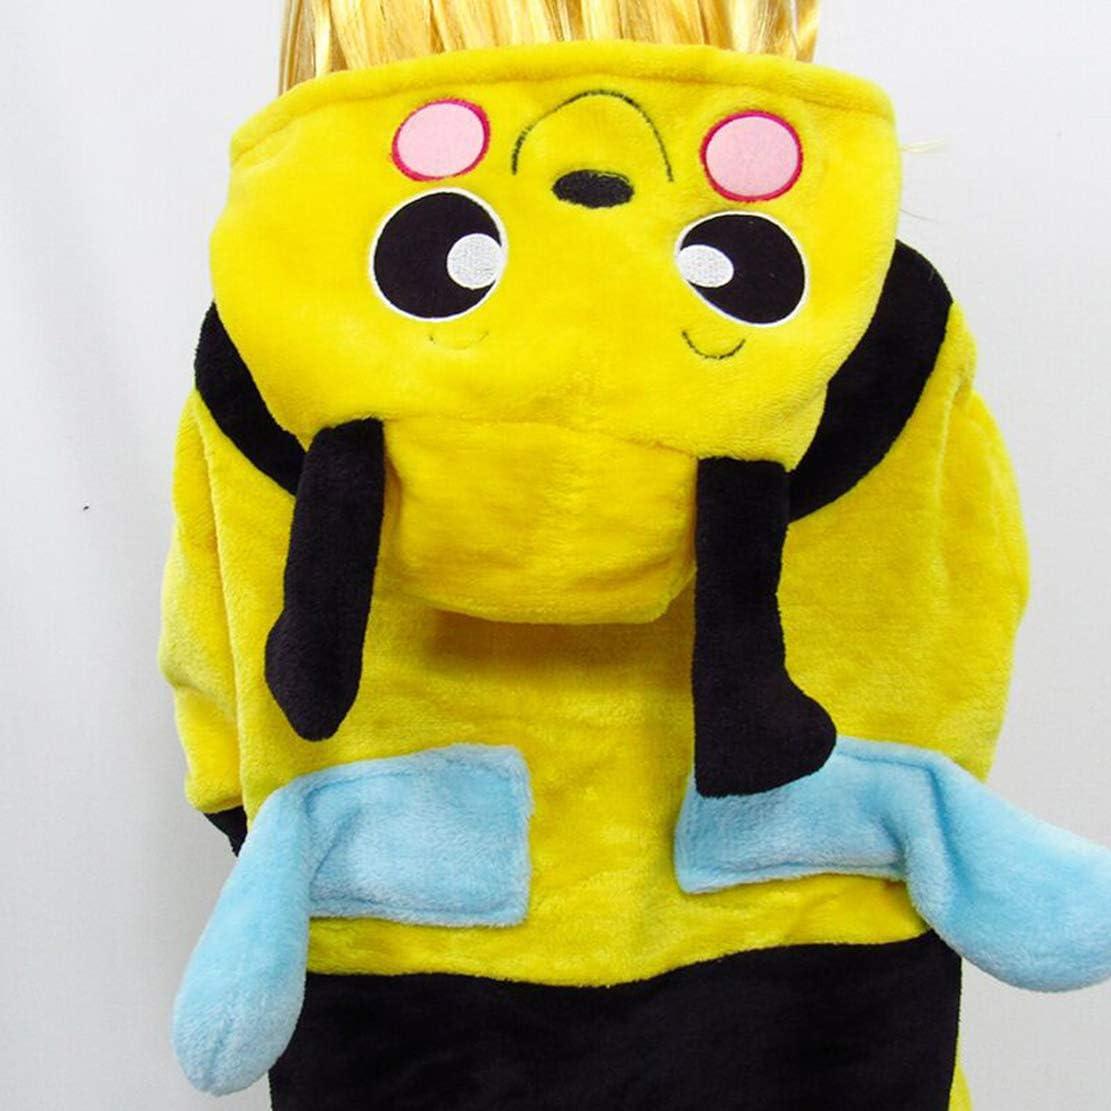 Womens Onesies//Girls Sleepsuits Bee//Kangaroo Pyjamas Cosplay Costume Loungewear Halloween Carnival Animal Nightwear Homewear Pajamas Overalls